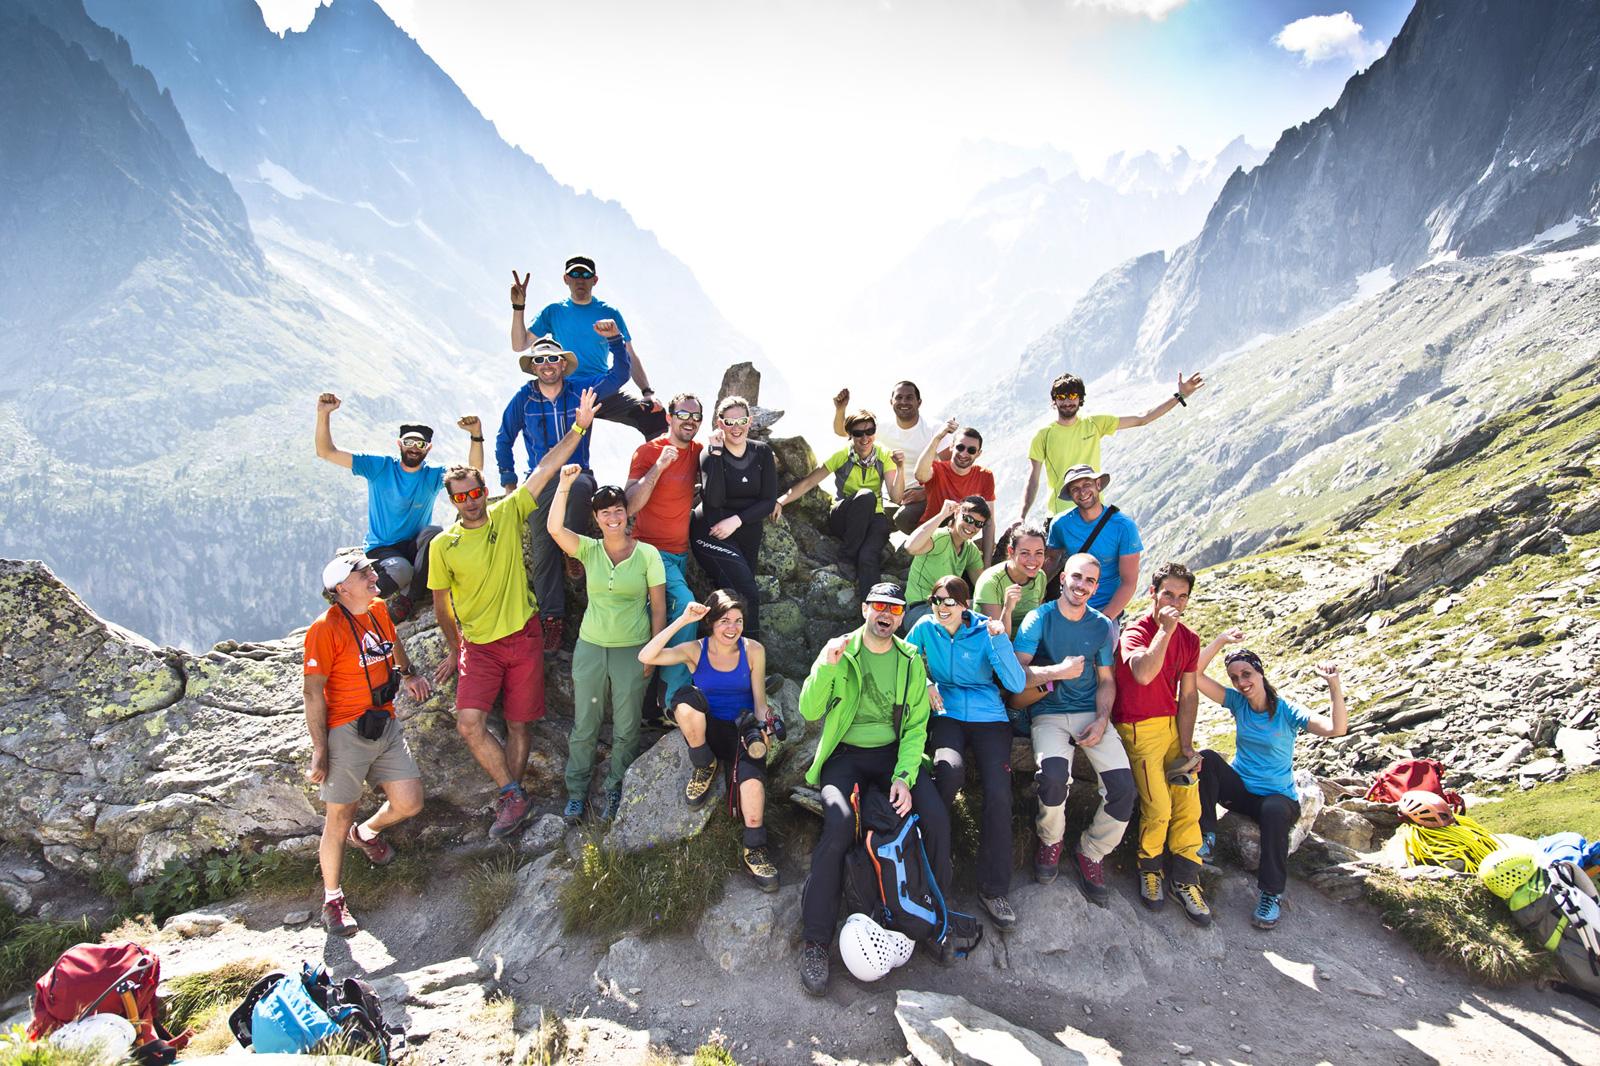 Crédit Photo : OT Chamonix Mont-Blanc